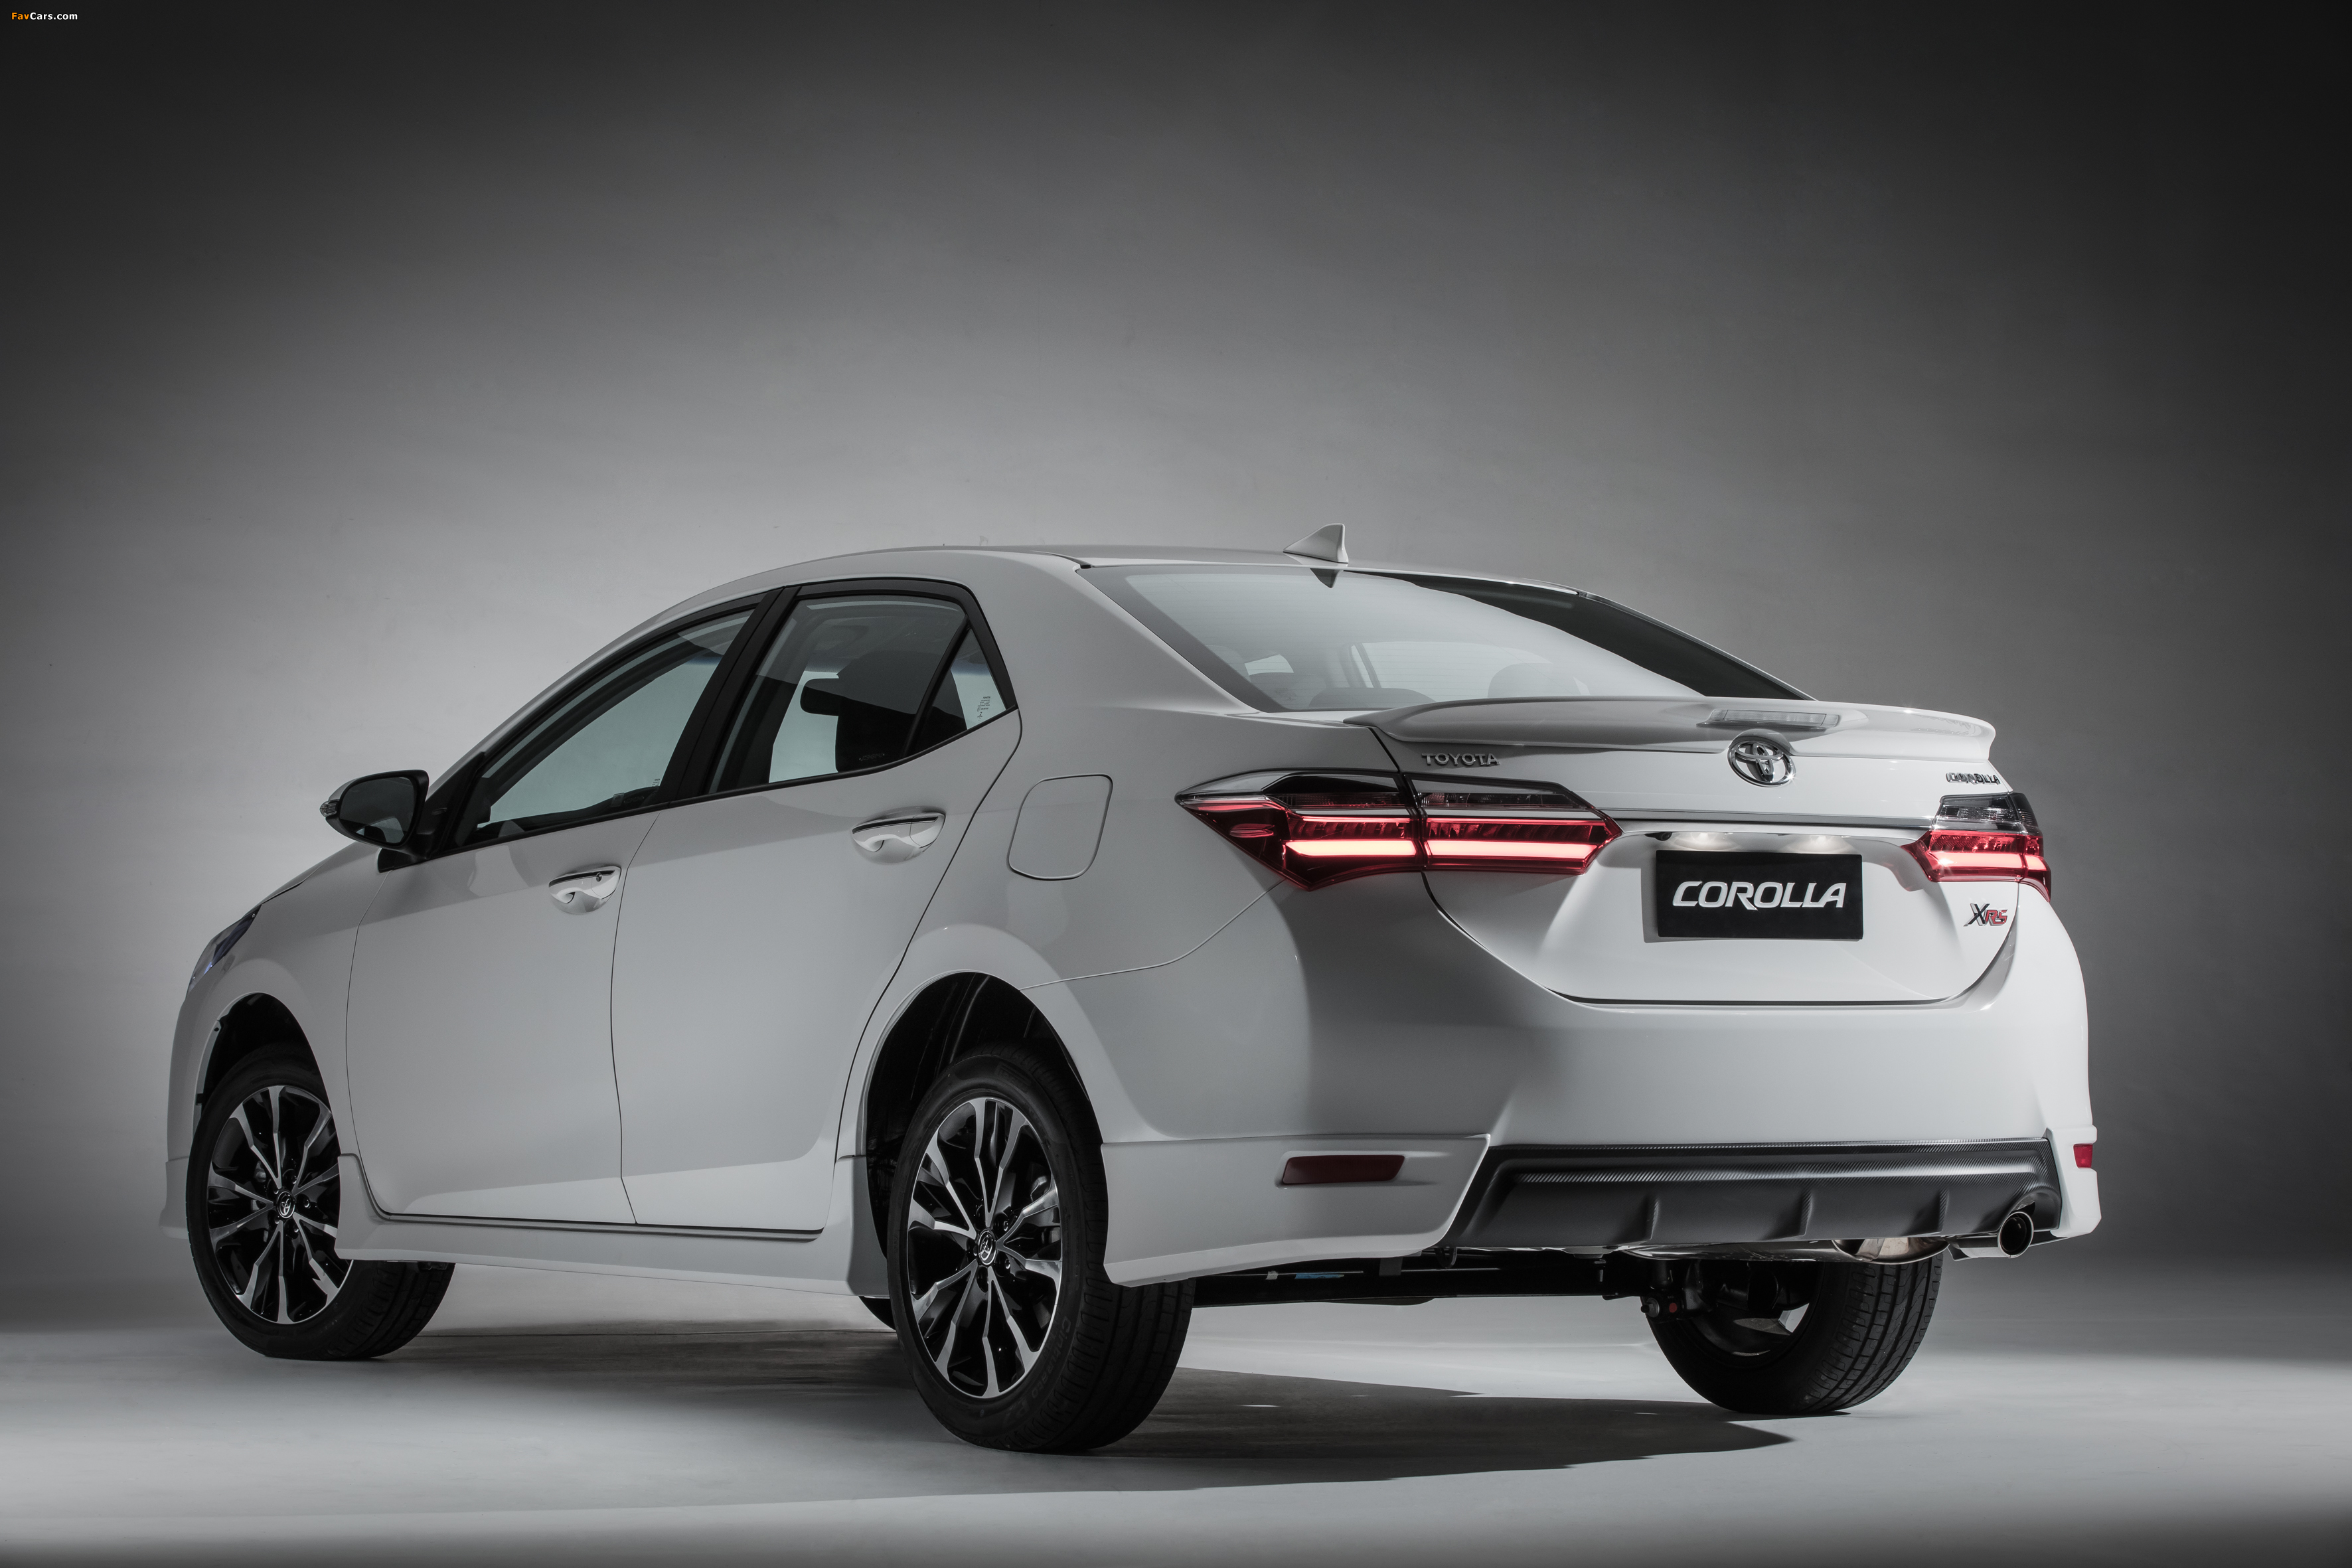 Toyota Corolla Xrs Latam 2017 Wallpapers 3543 X 2362